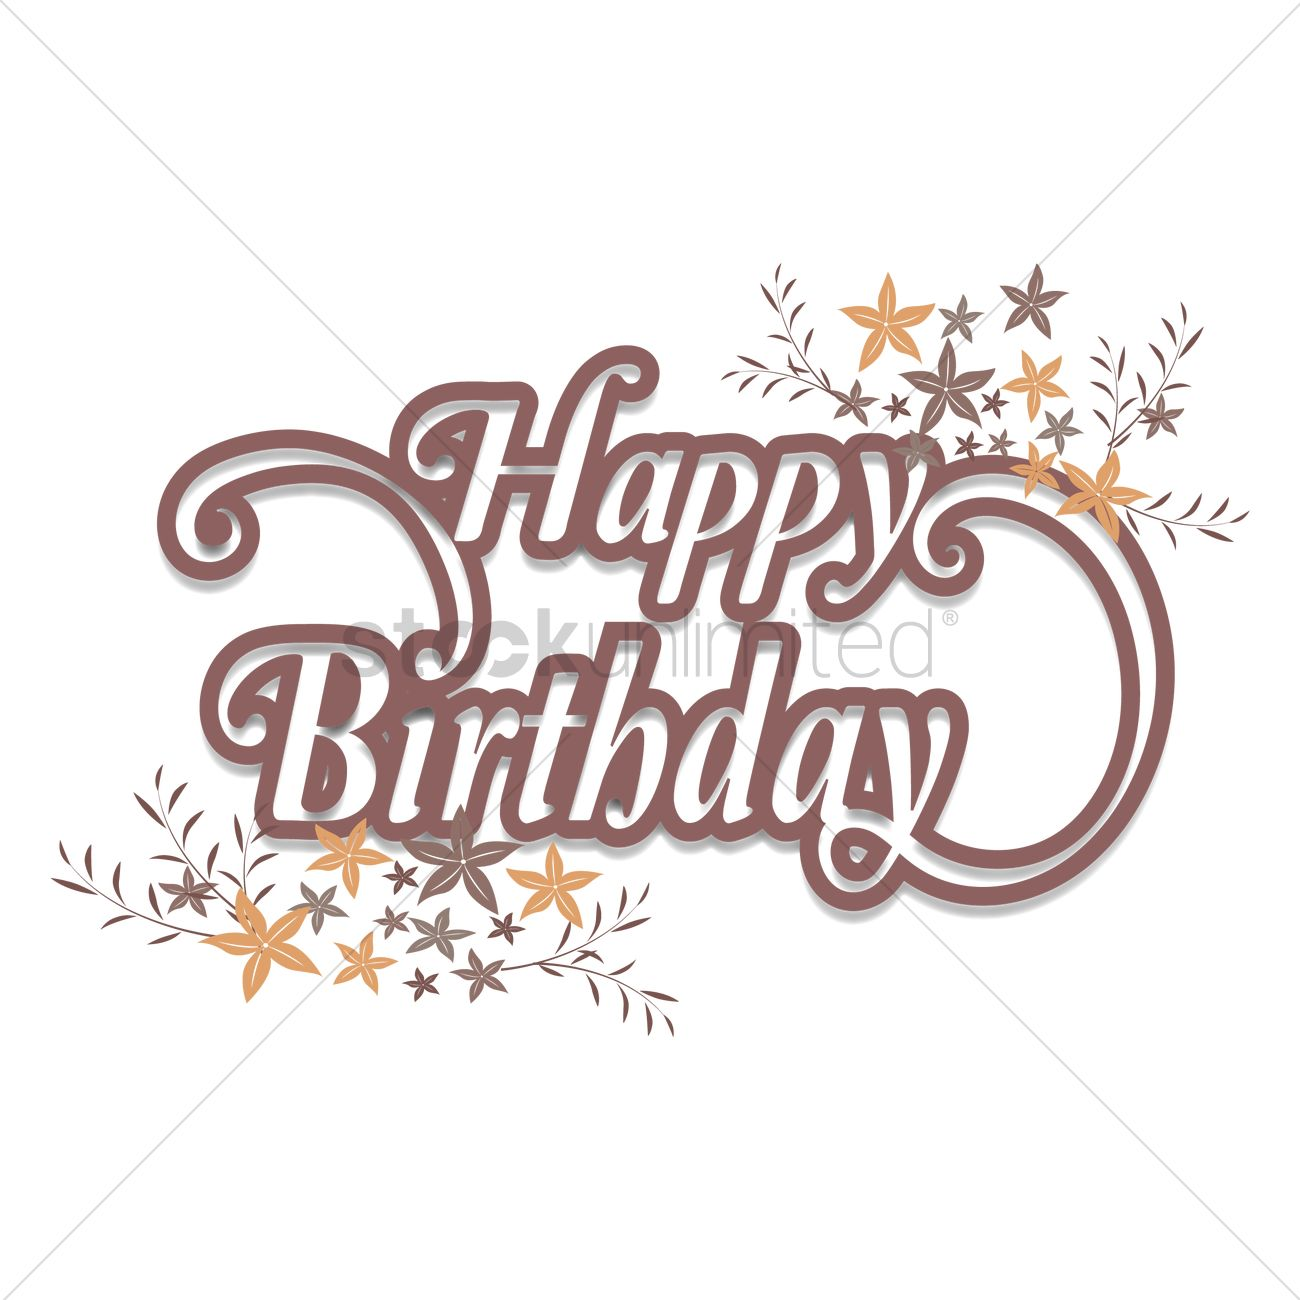 Free Happy Birthday Vector Image 1606868 Stockunlimited